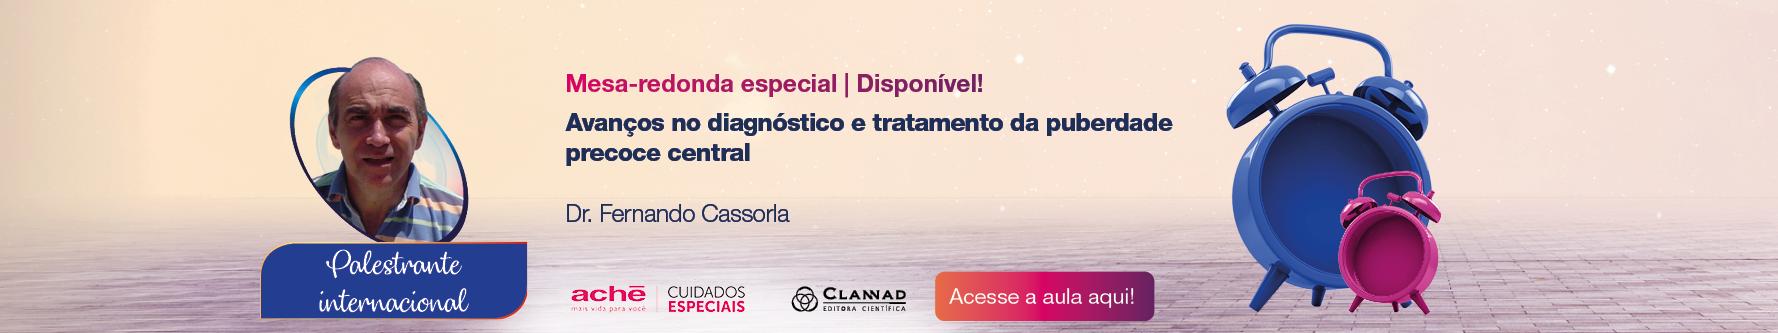 ConexaoEndoped-aula-especial-fernando3